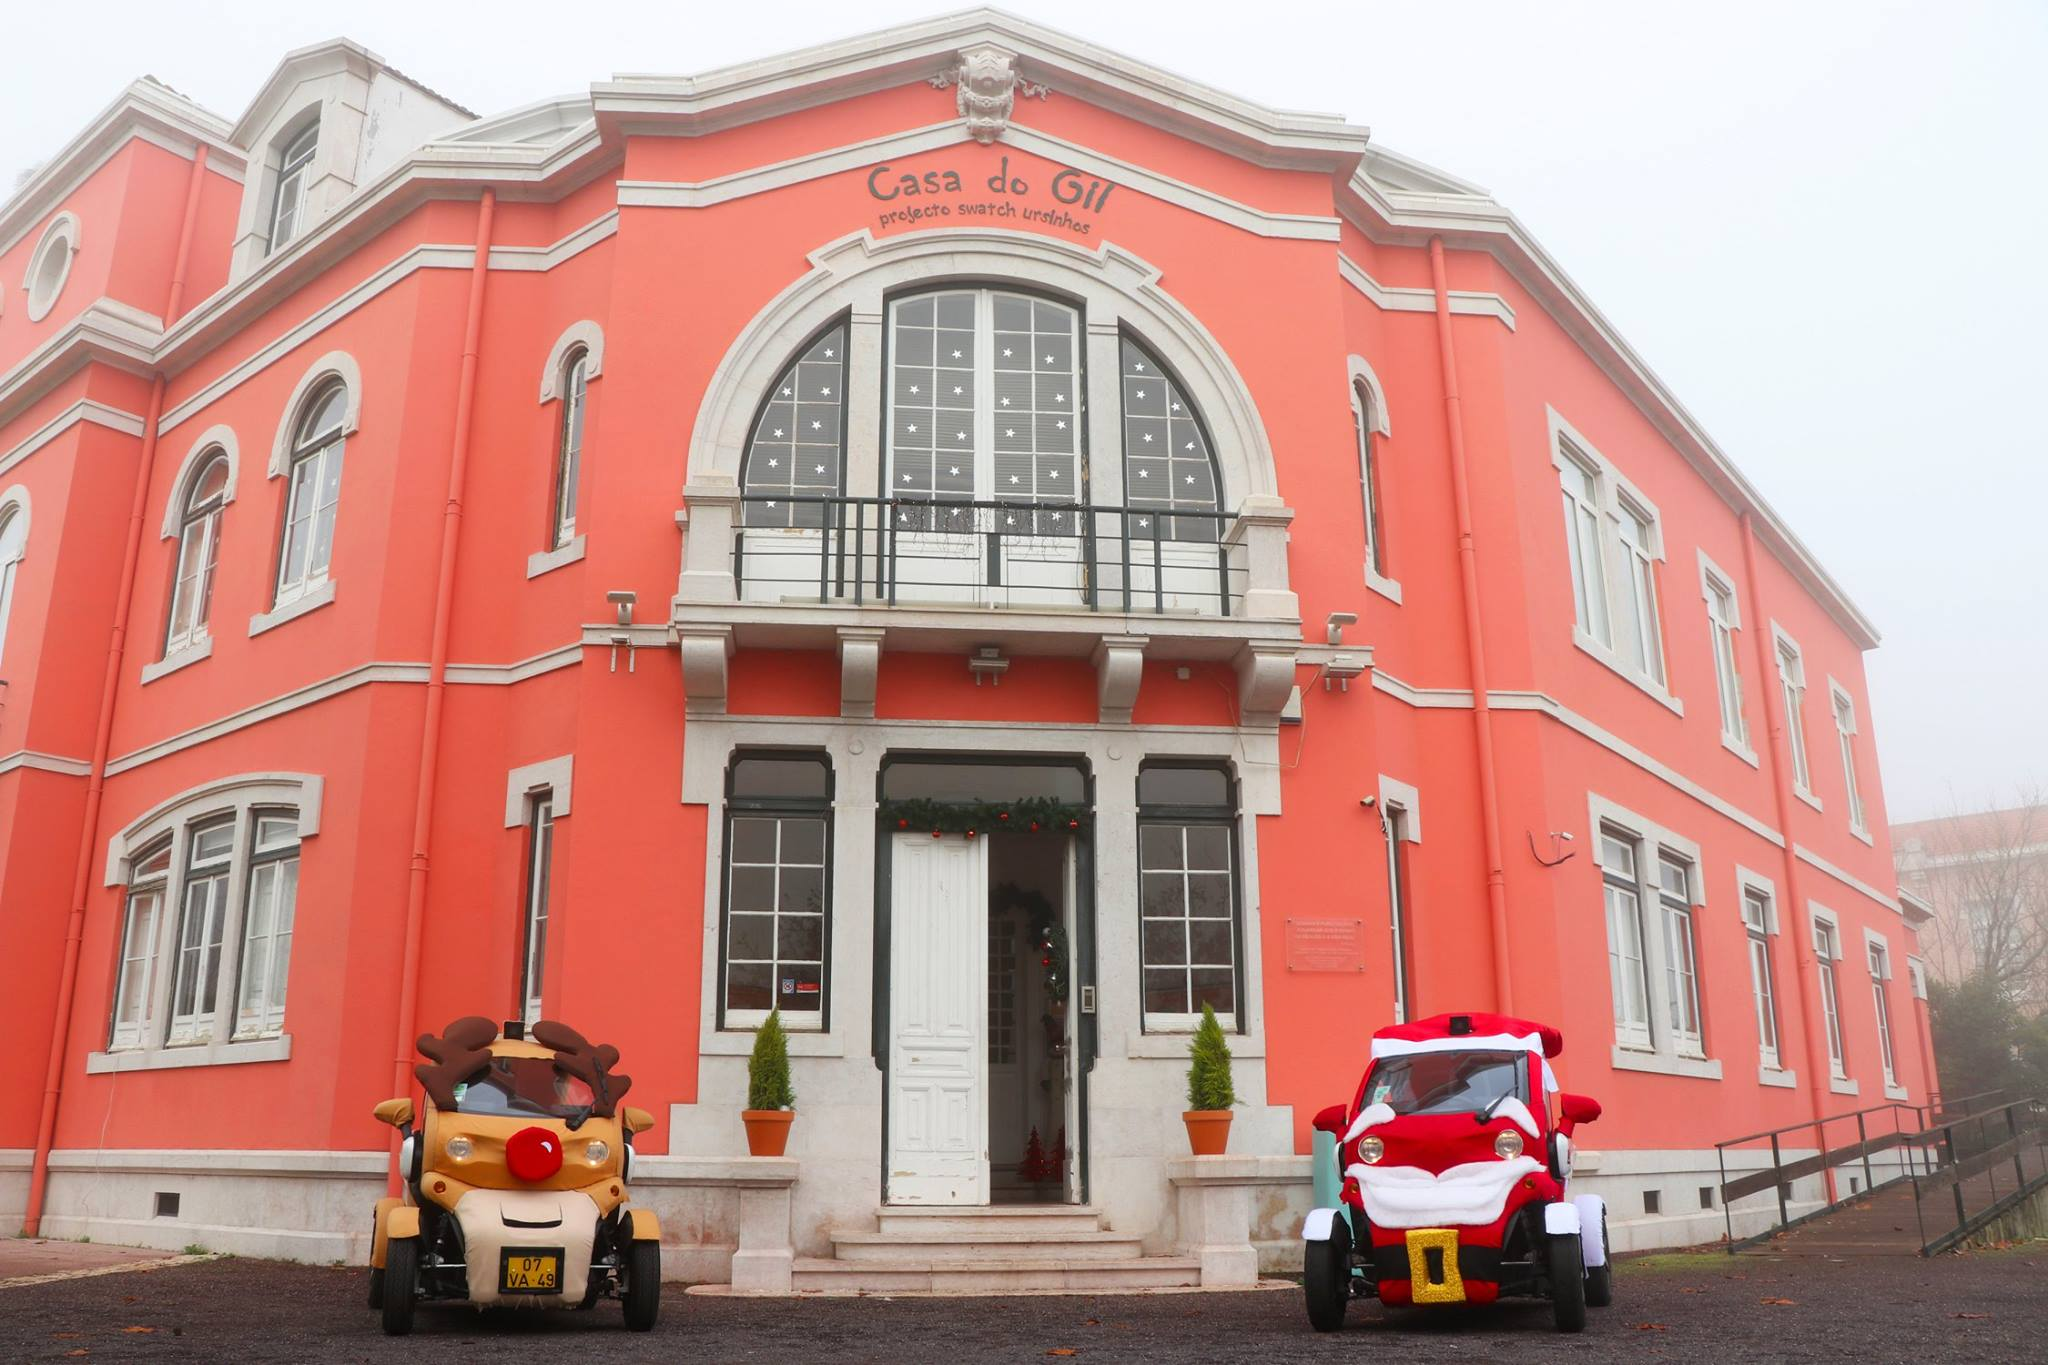 Live Electric Tours - Célia Lobo - Cars - Twizy - Christmas - Santa Claus - Santa - Reindeer - Deer - Lisboa - Lisbon